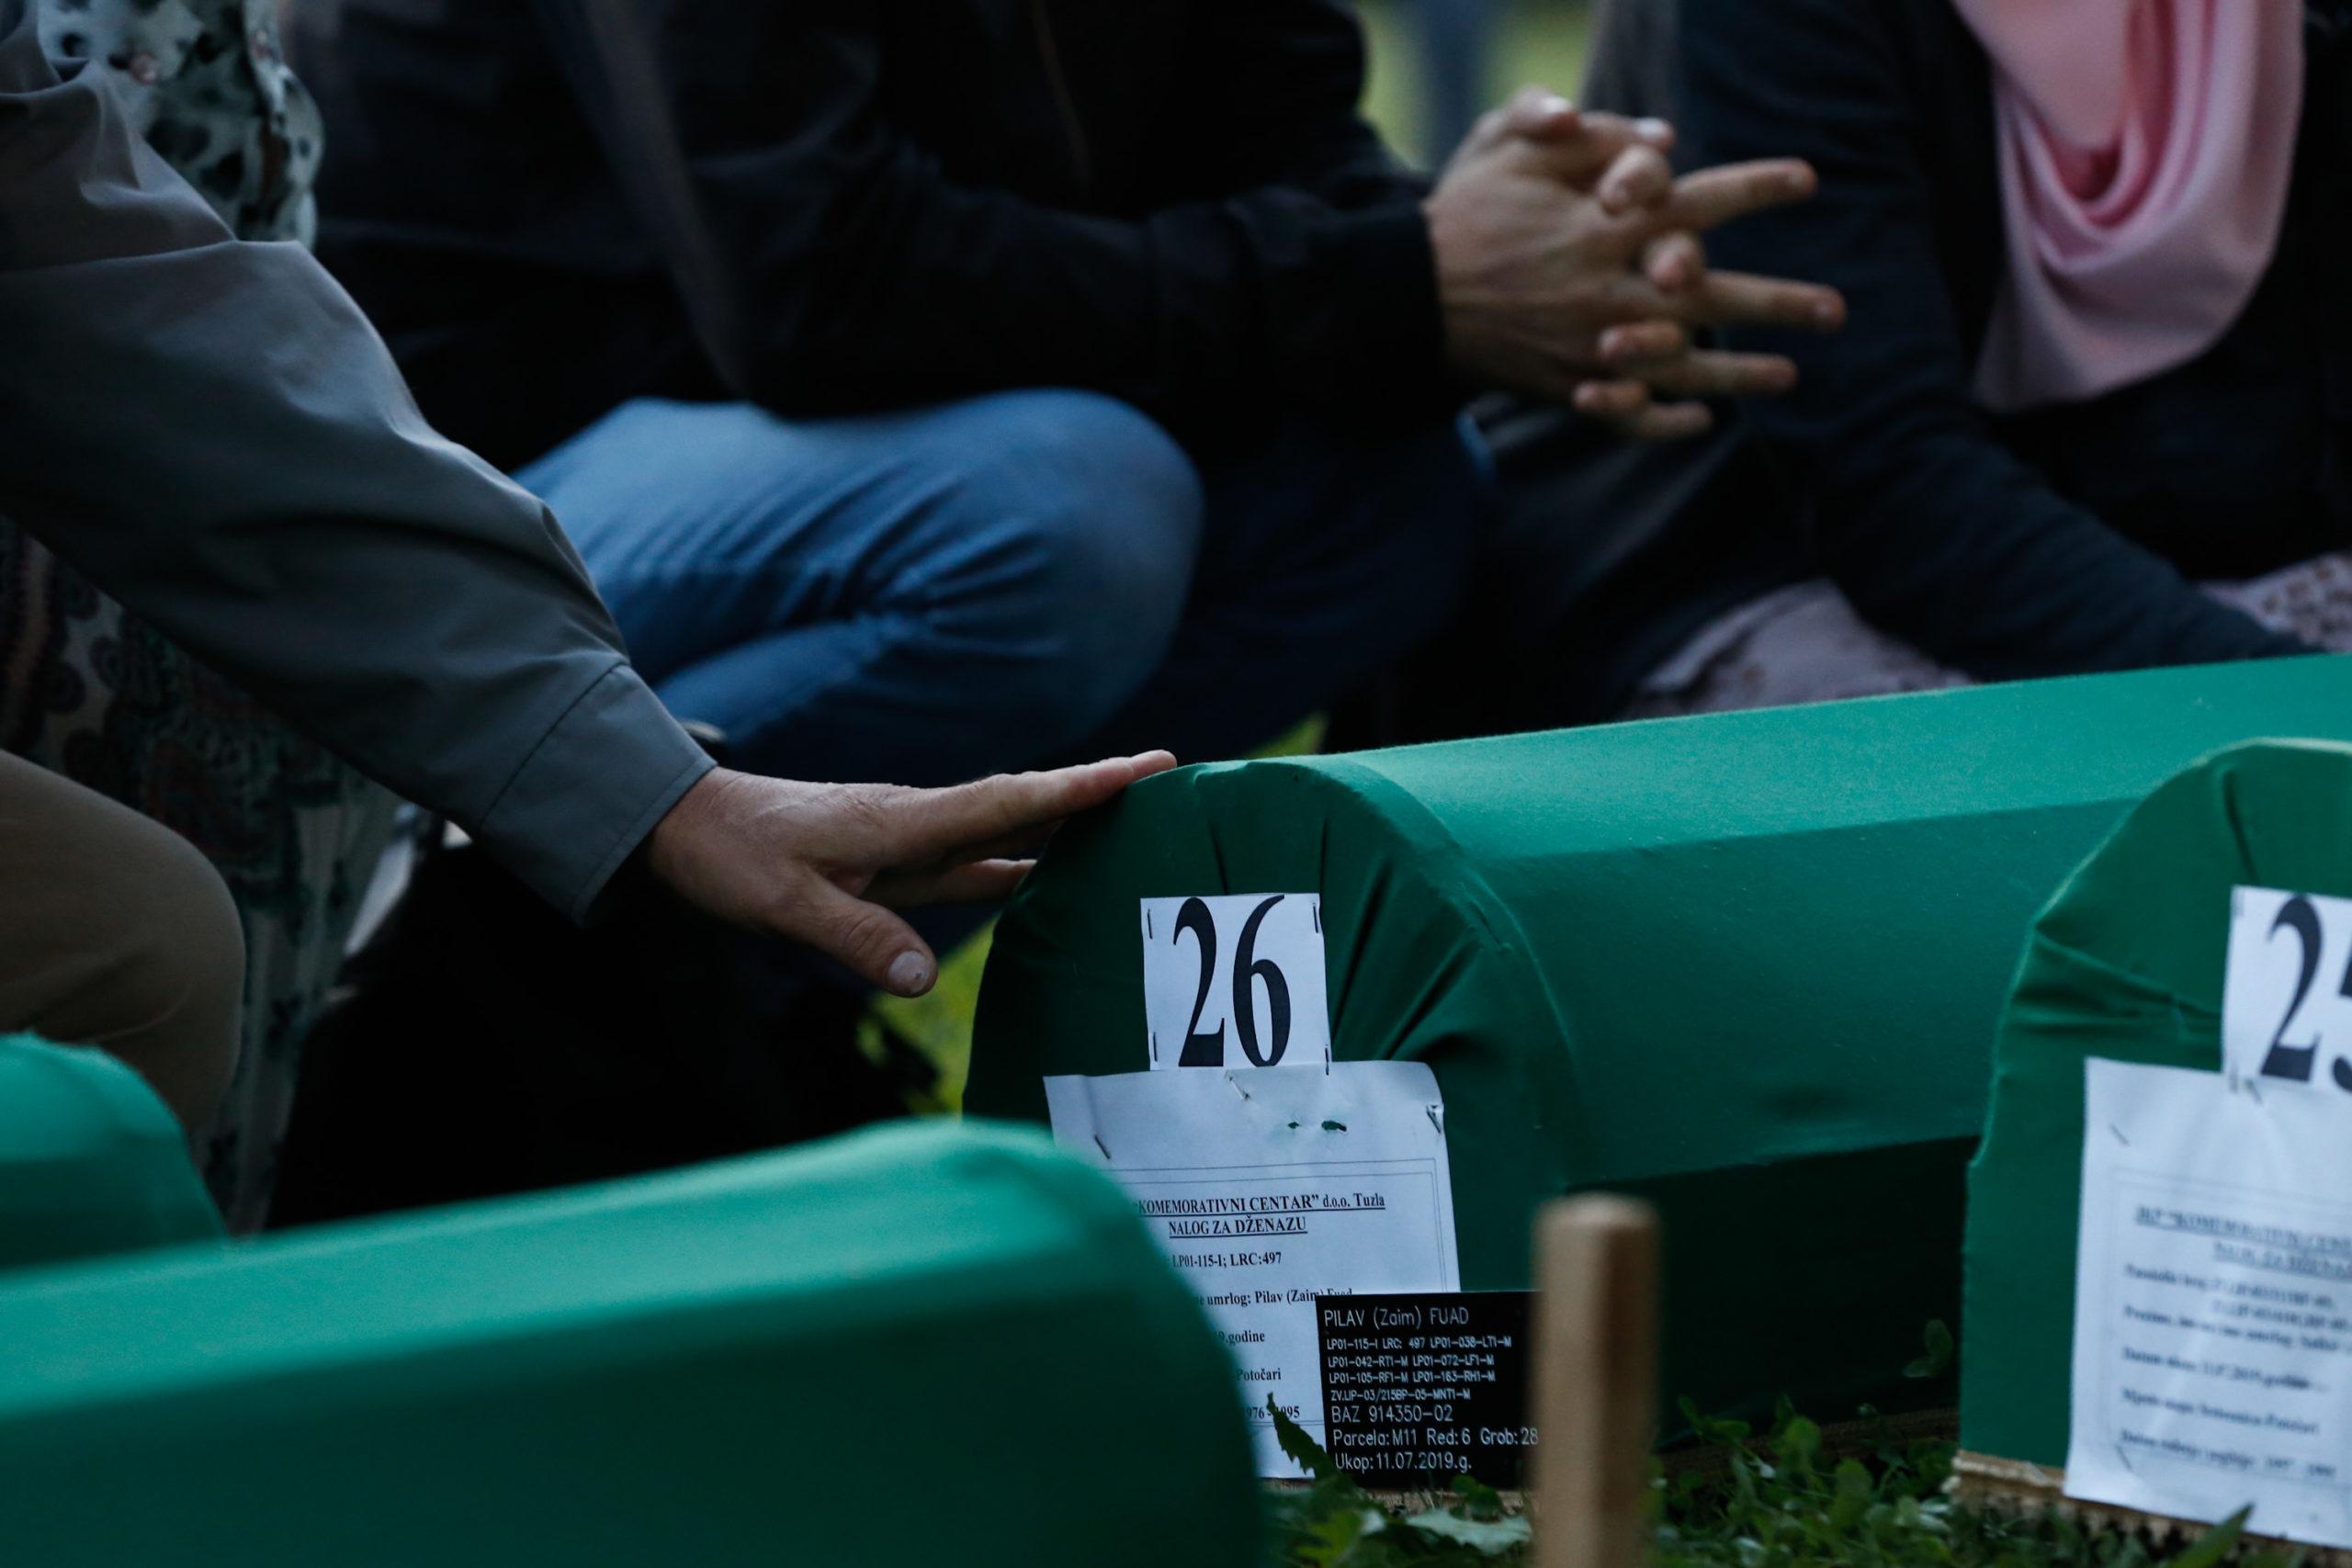 ekshumacija-kod-kalinovika:-bosnjaci-likvidirani-i-baceni-niz-kanjon-rijeke-bistrice